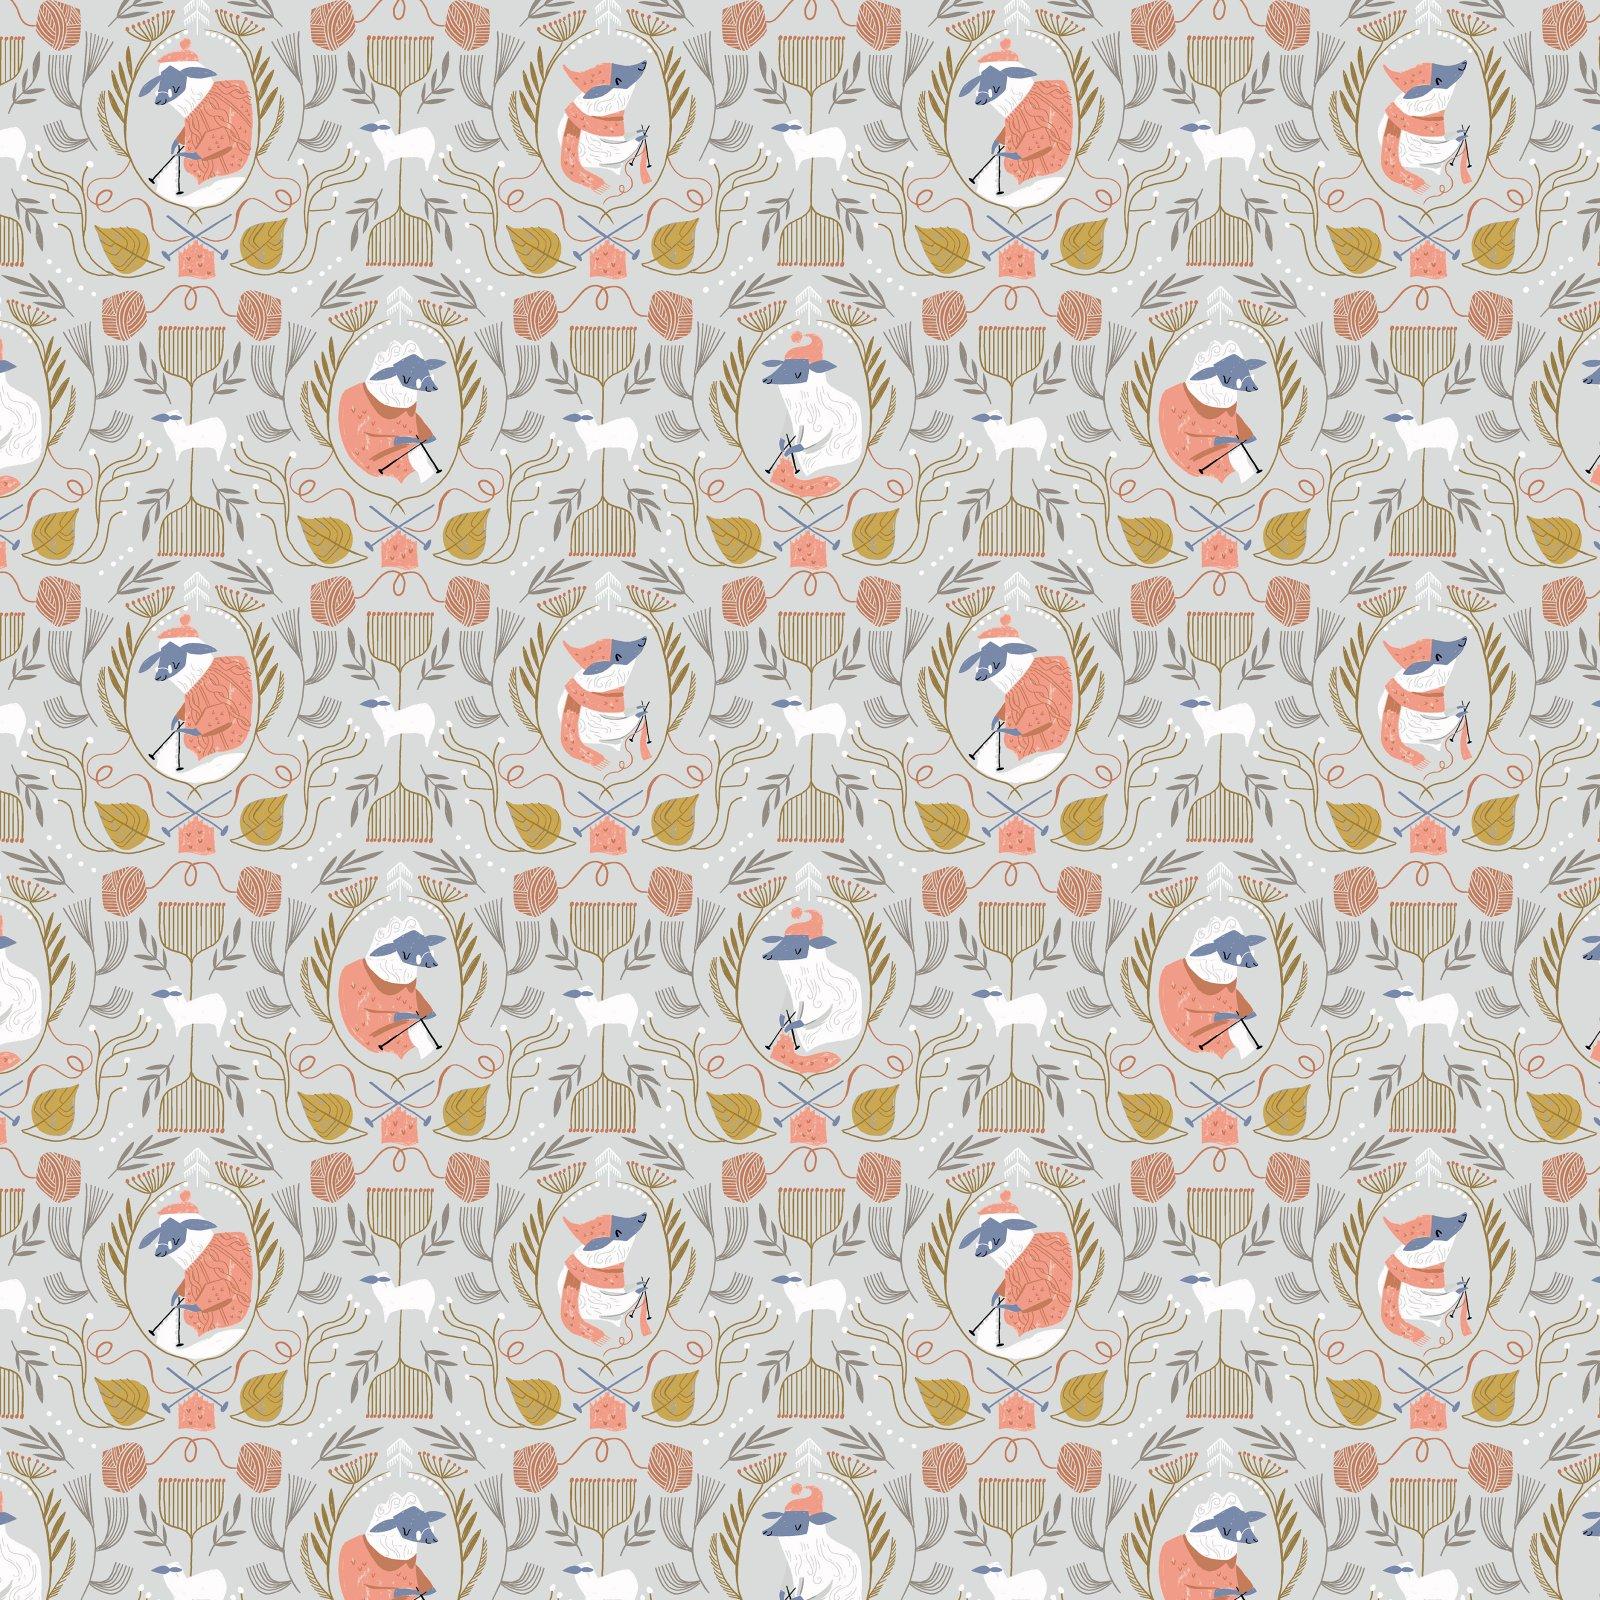 Rae Ritchie Sheepish - Sheepish (Oatmeal)